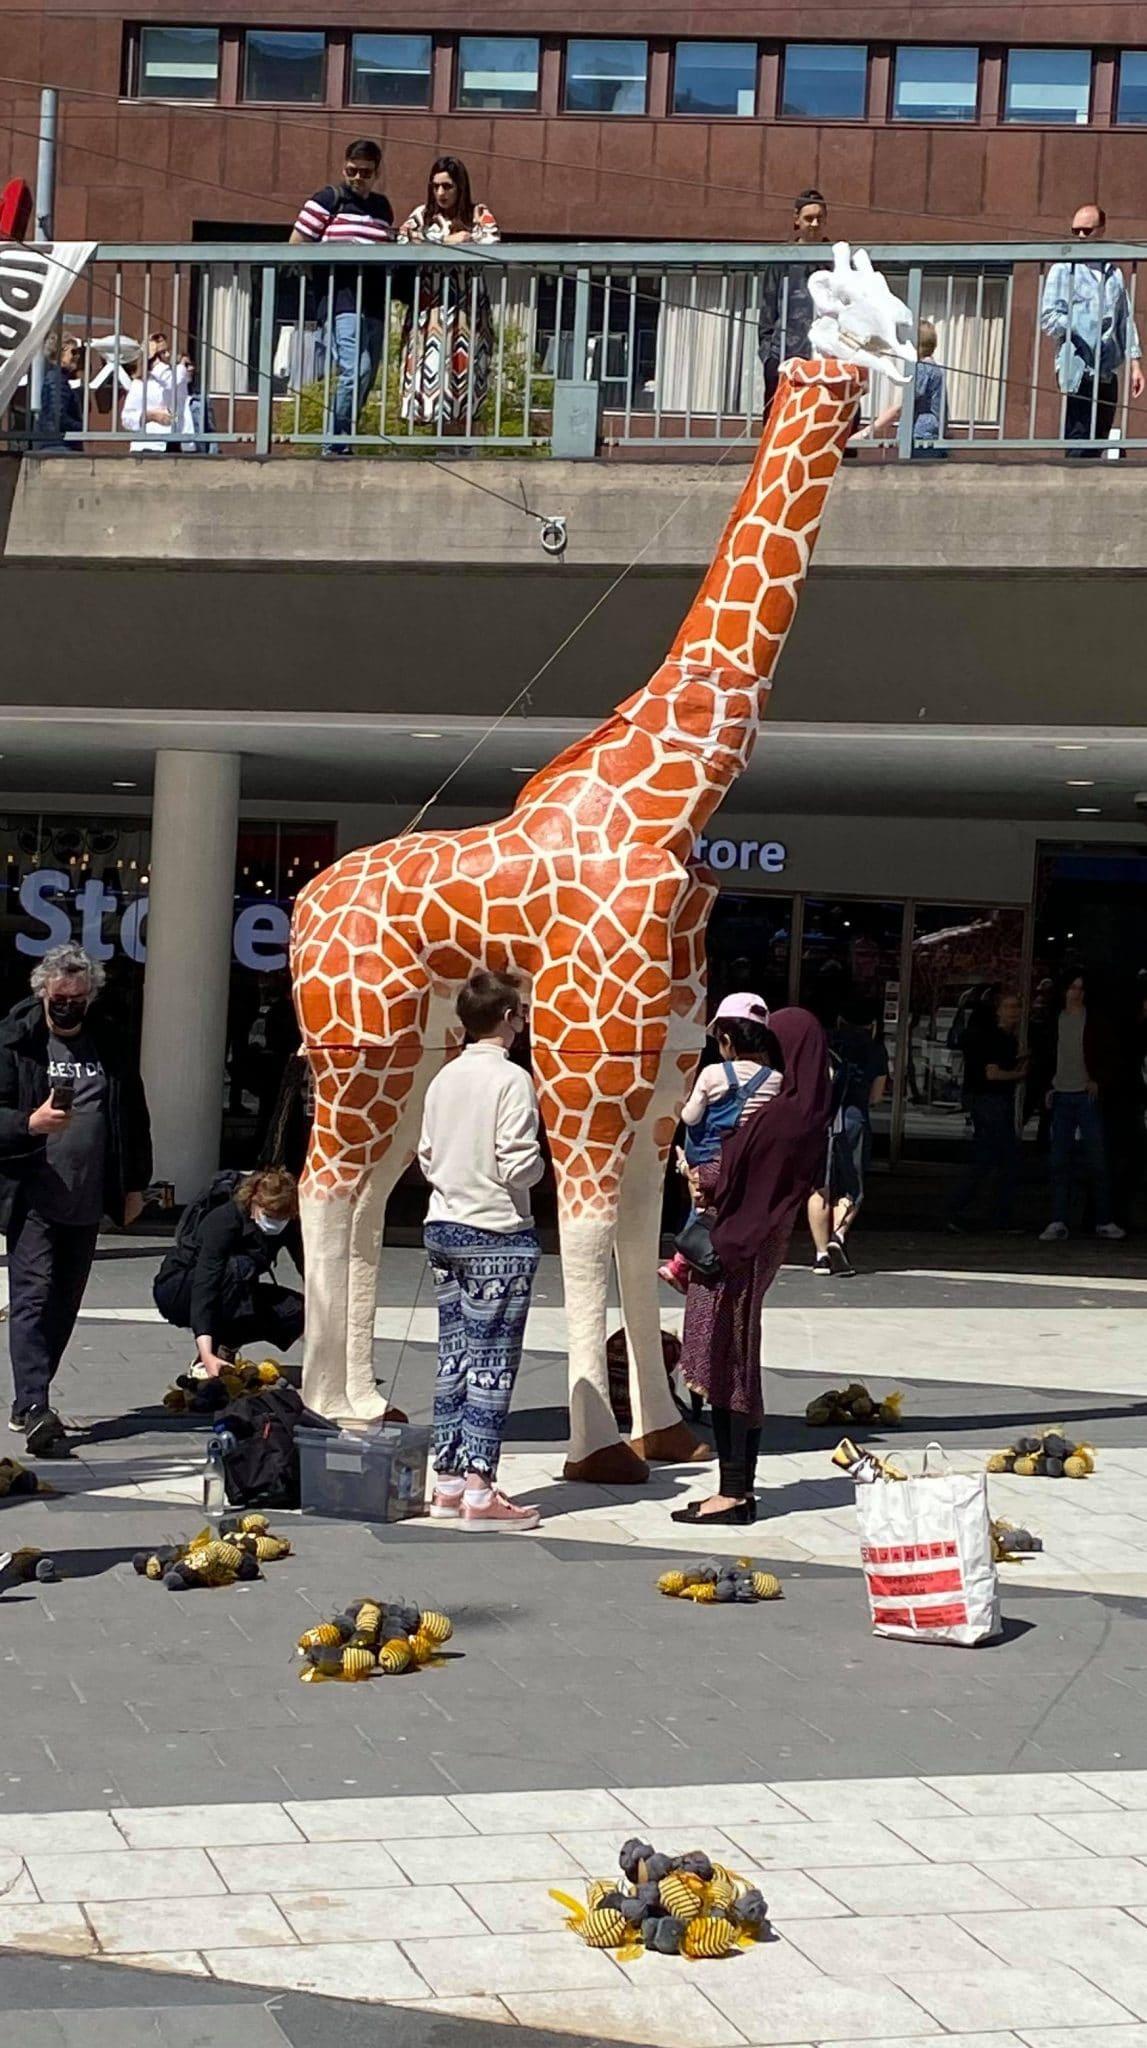 Large full-sized paper mache giraffe